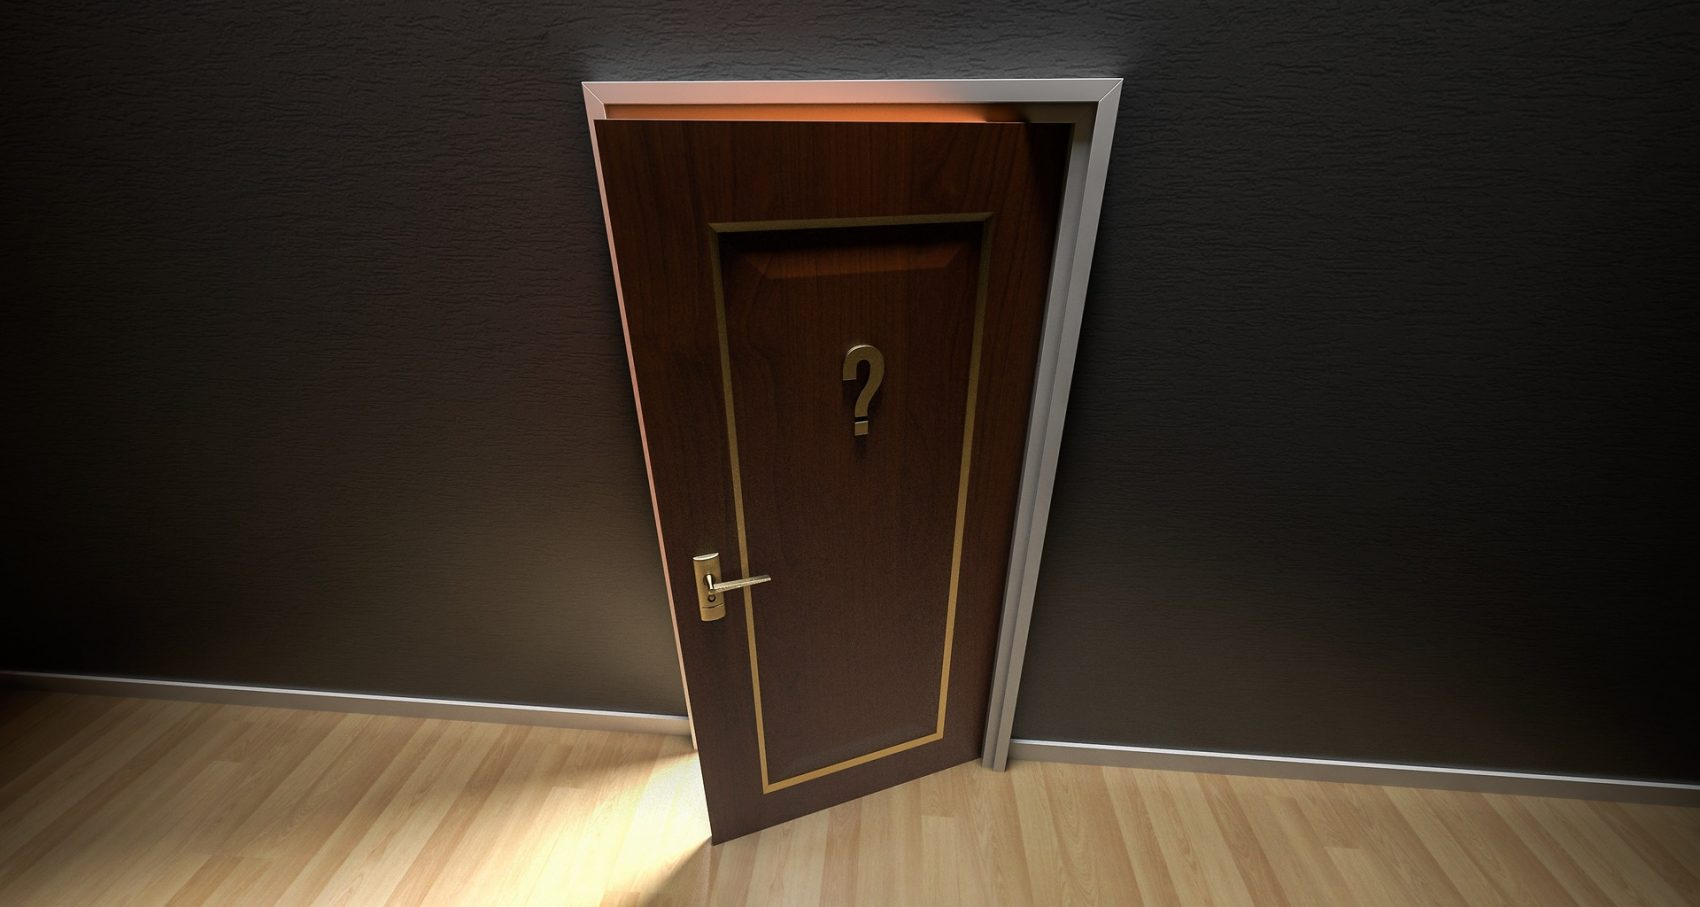 How Do I Get Treatment for Meth Addiction?